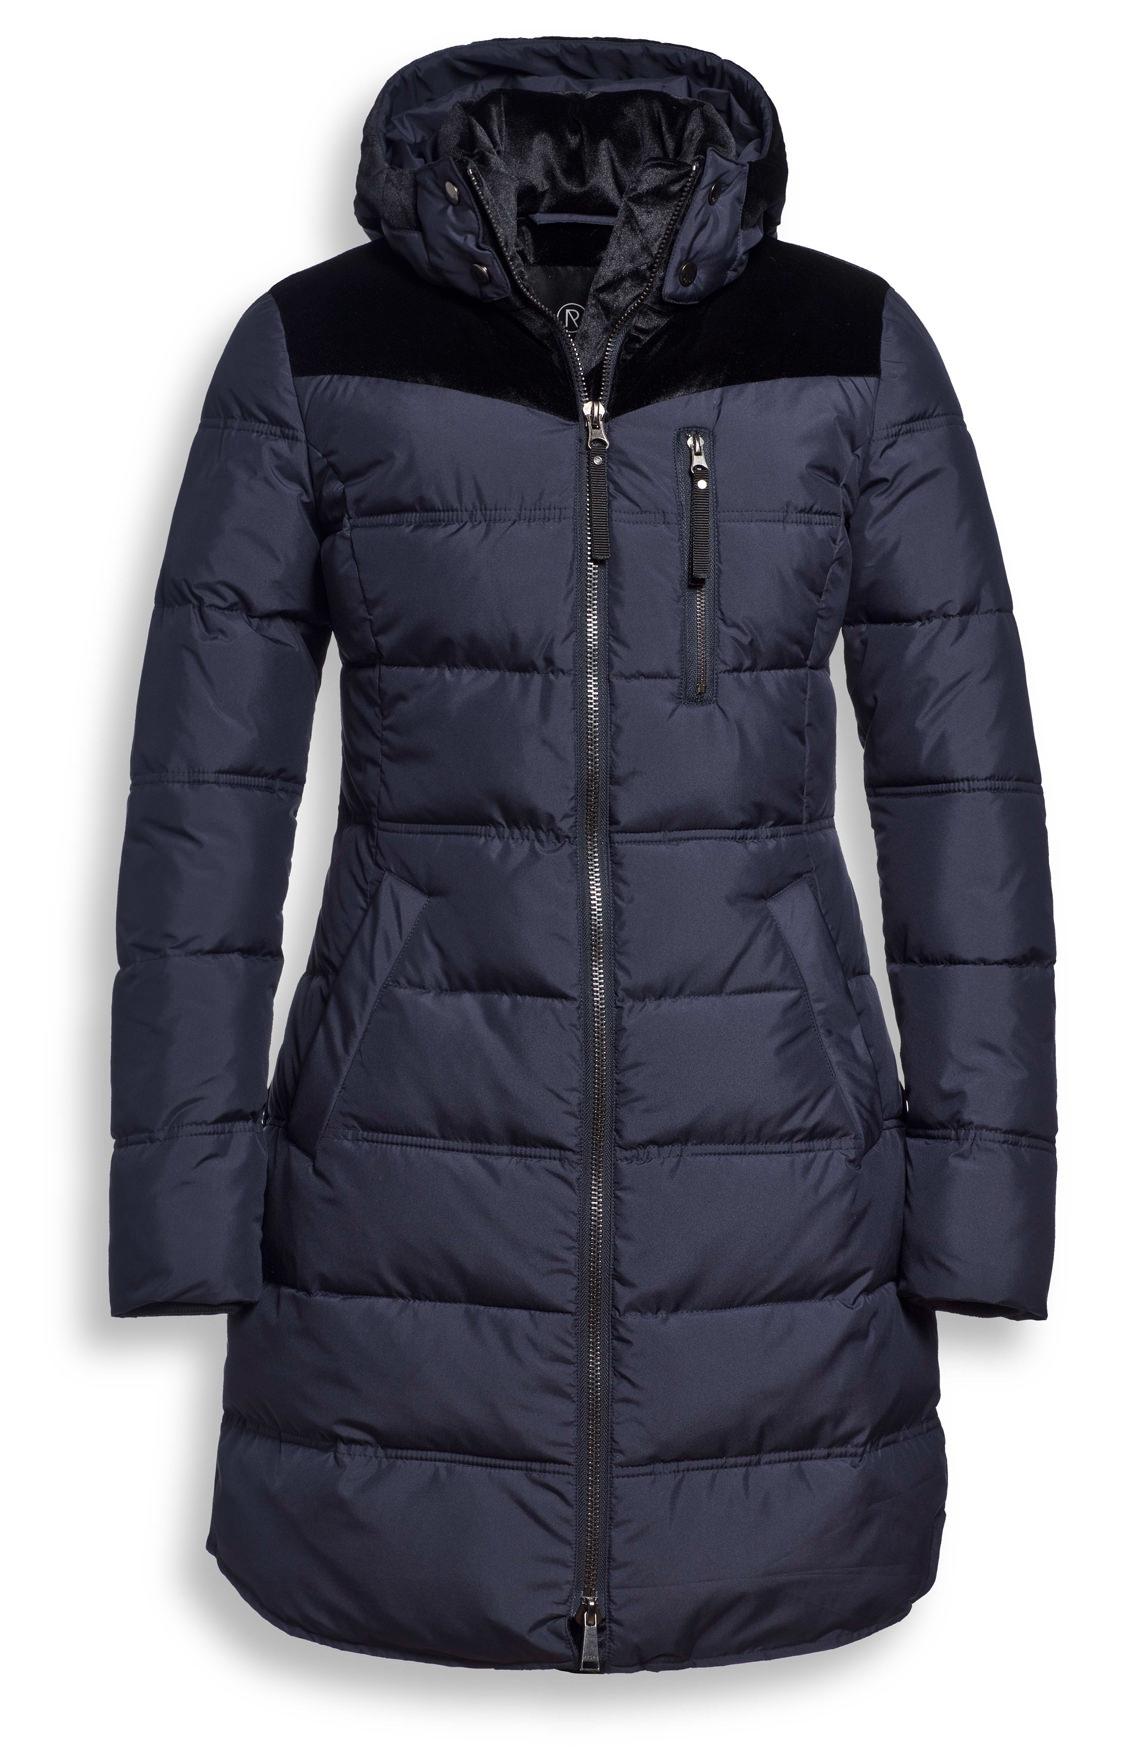 Donderblauwe dames jas Reset Nadia - 502 night sky